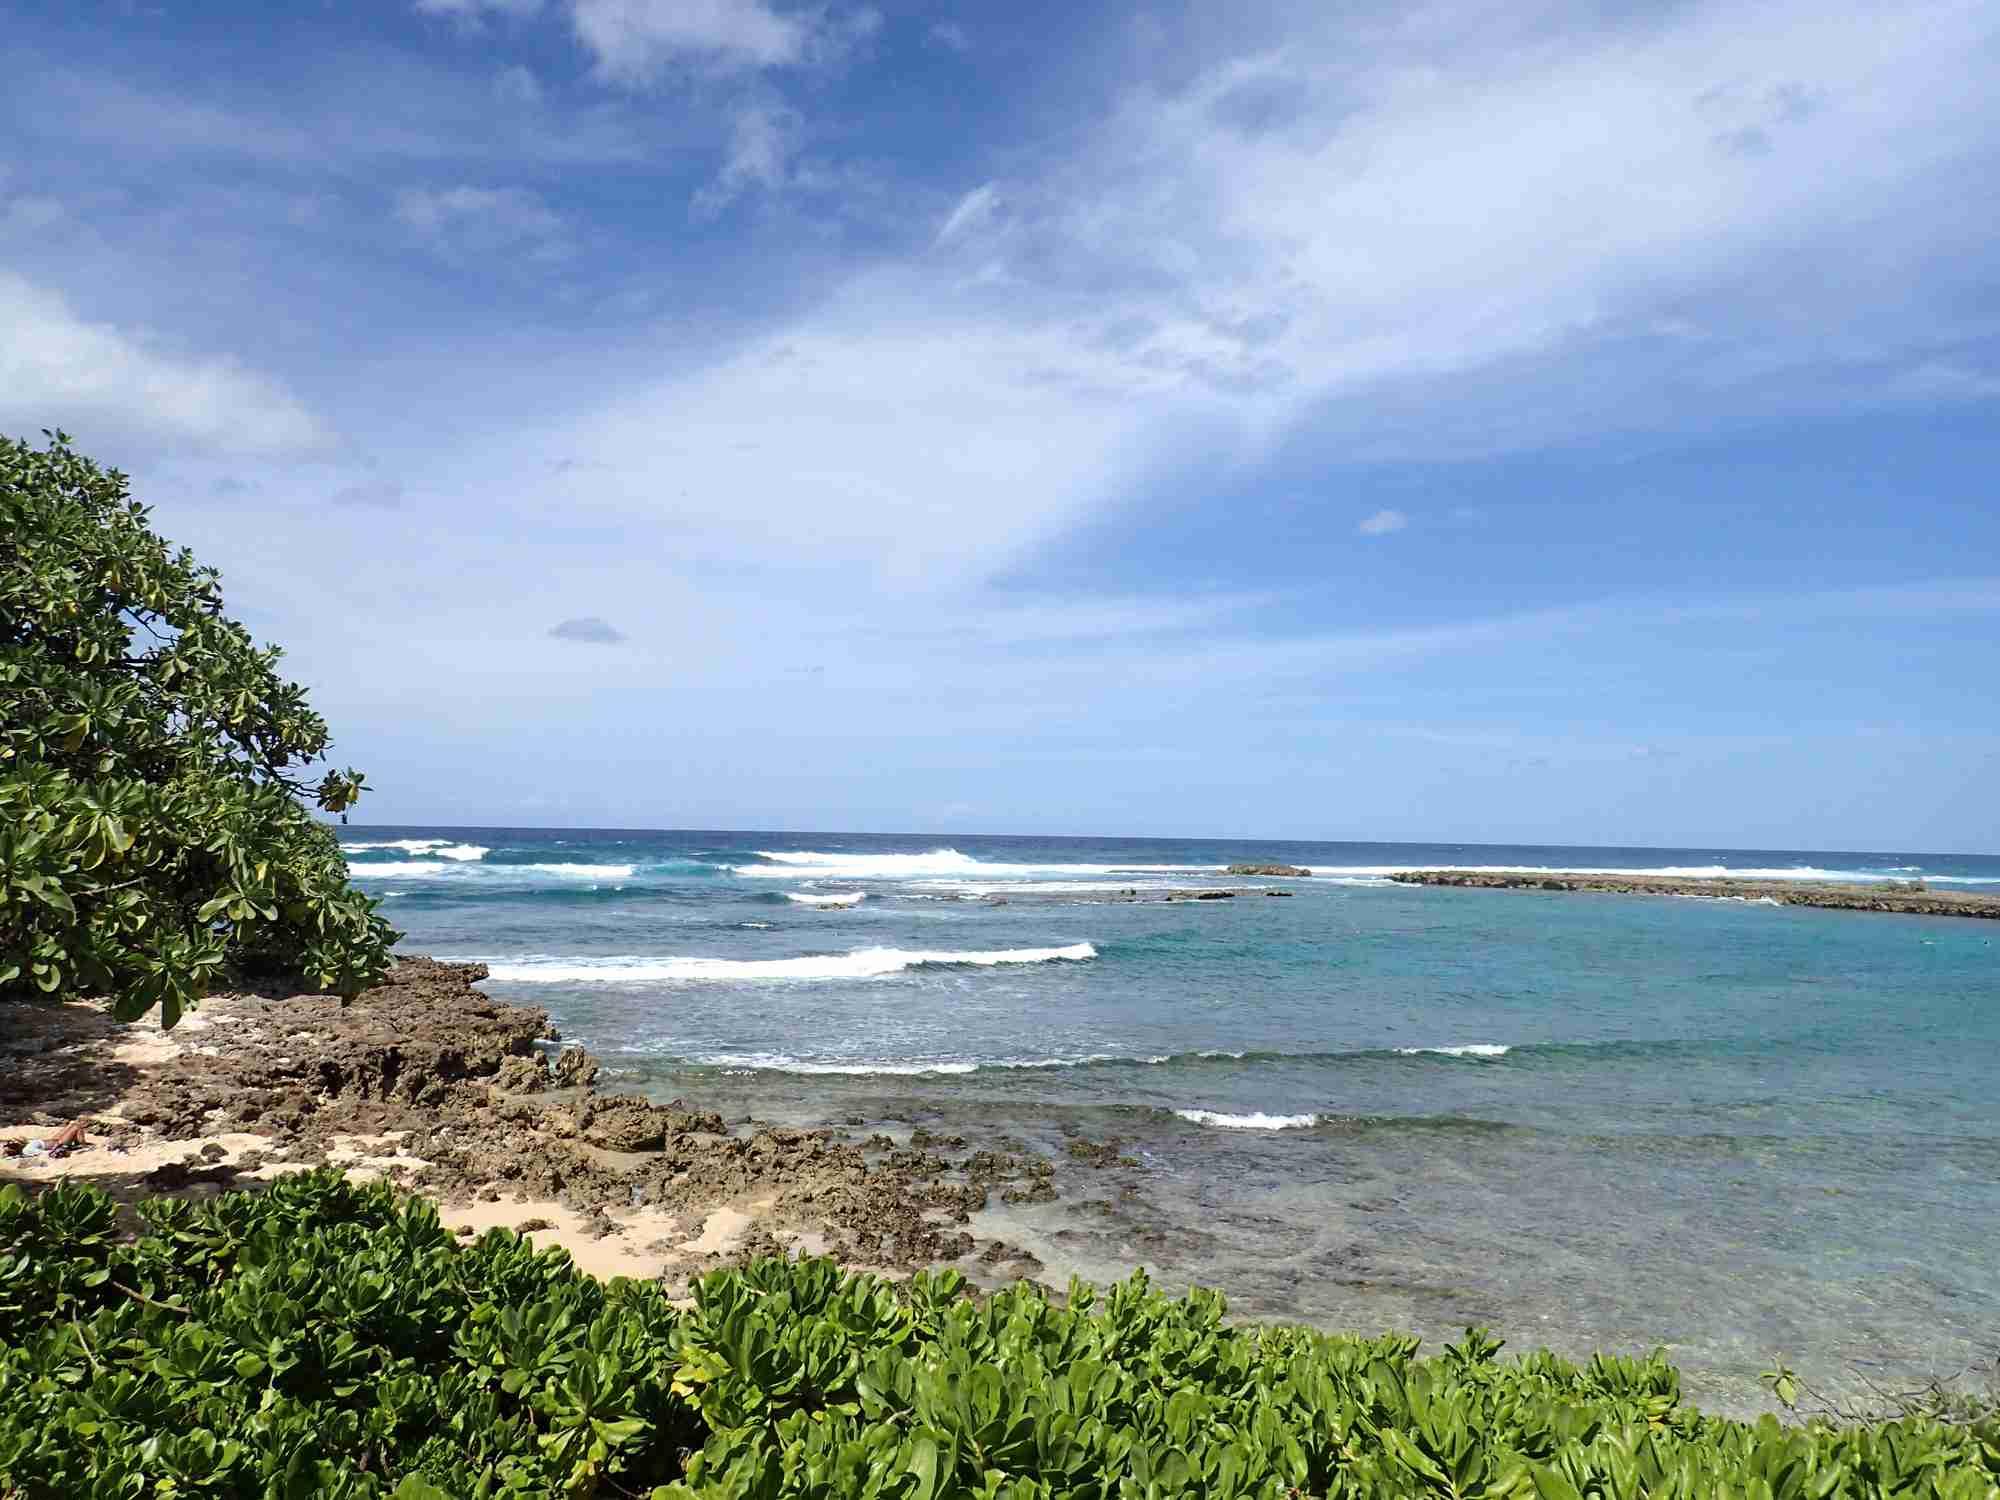 Kuilima Cove Beach at Turtle Bay, Oahu Island North Shore,